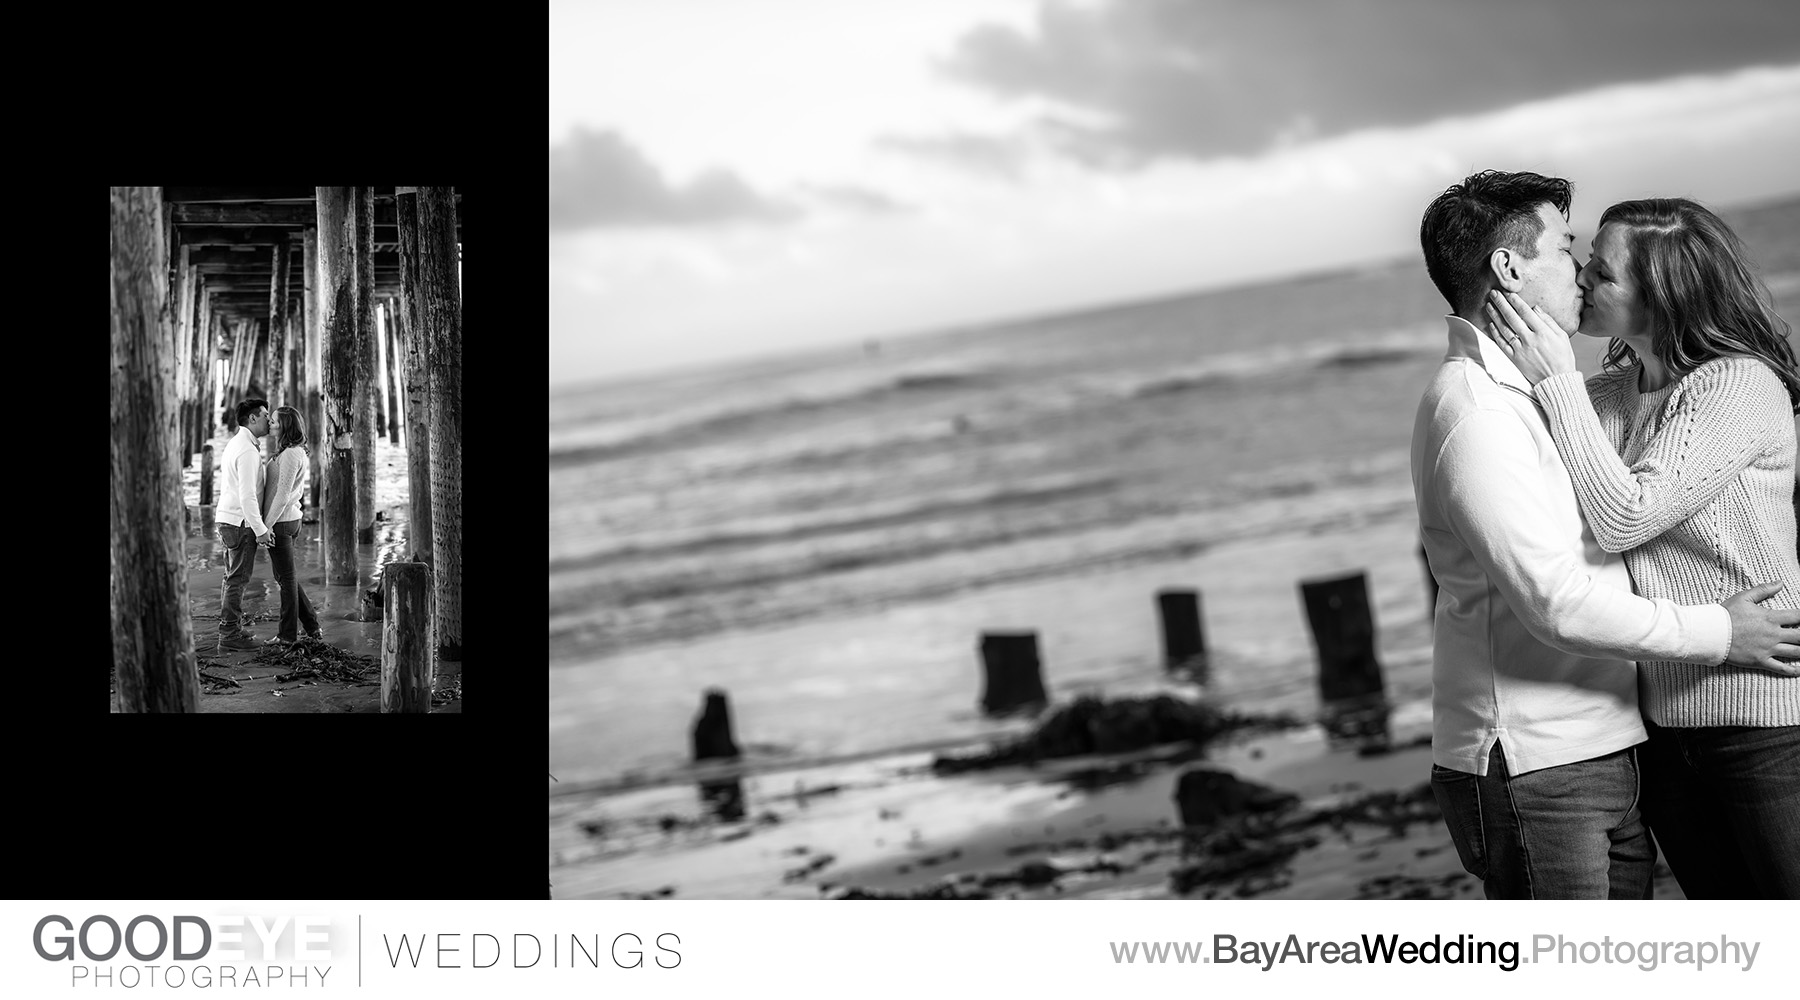 Capitola Beach Engagement Photos - by Bay Area wedding photograp